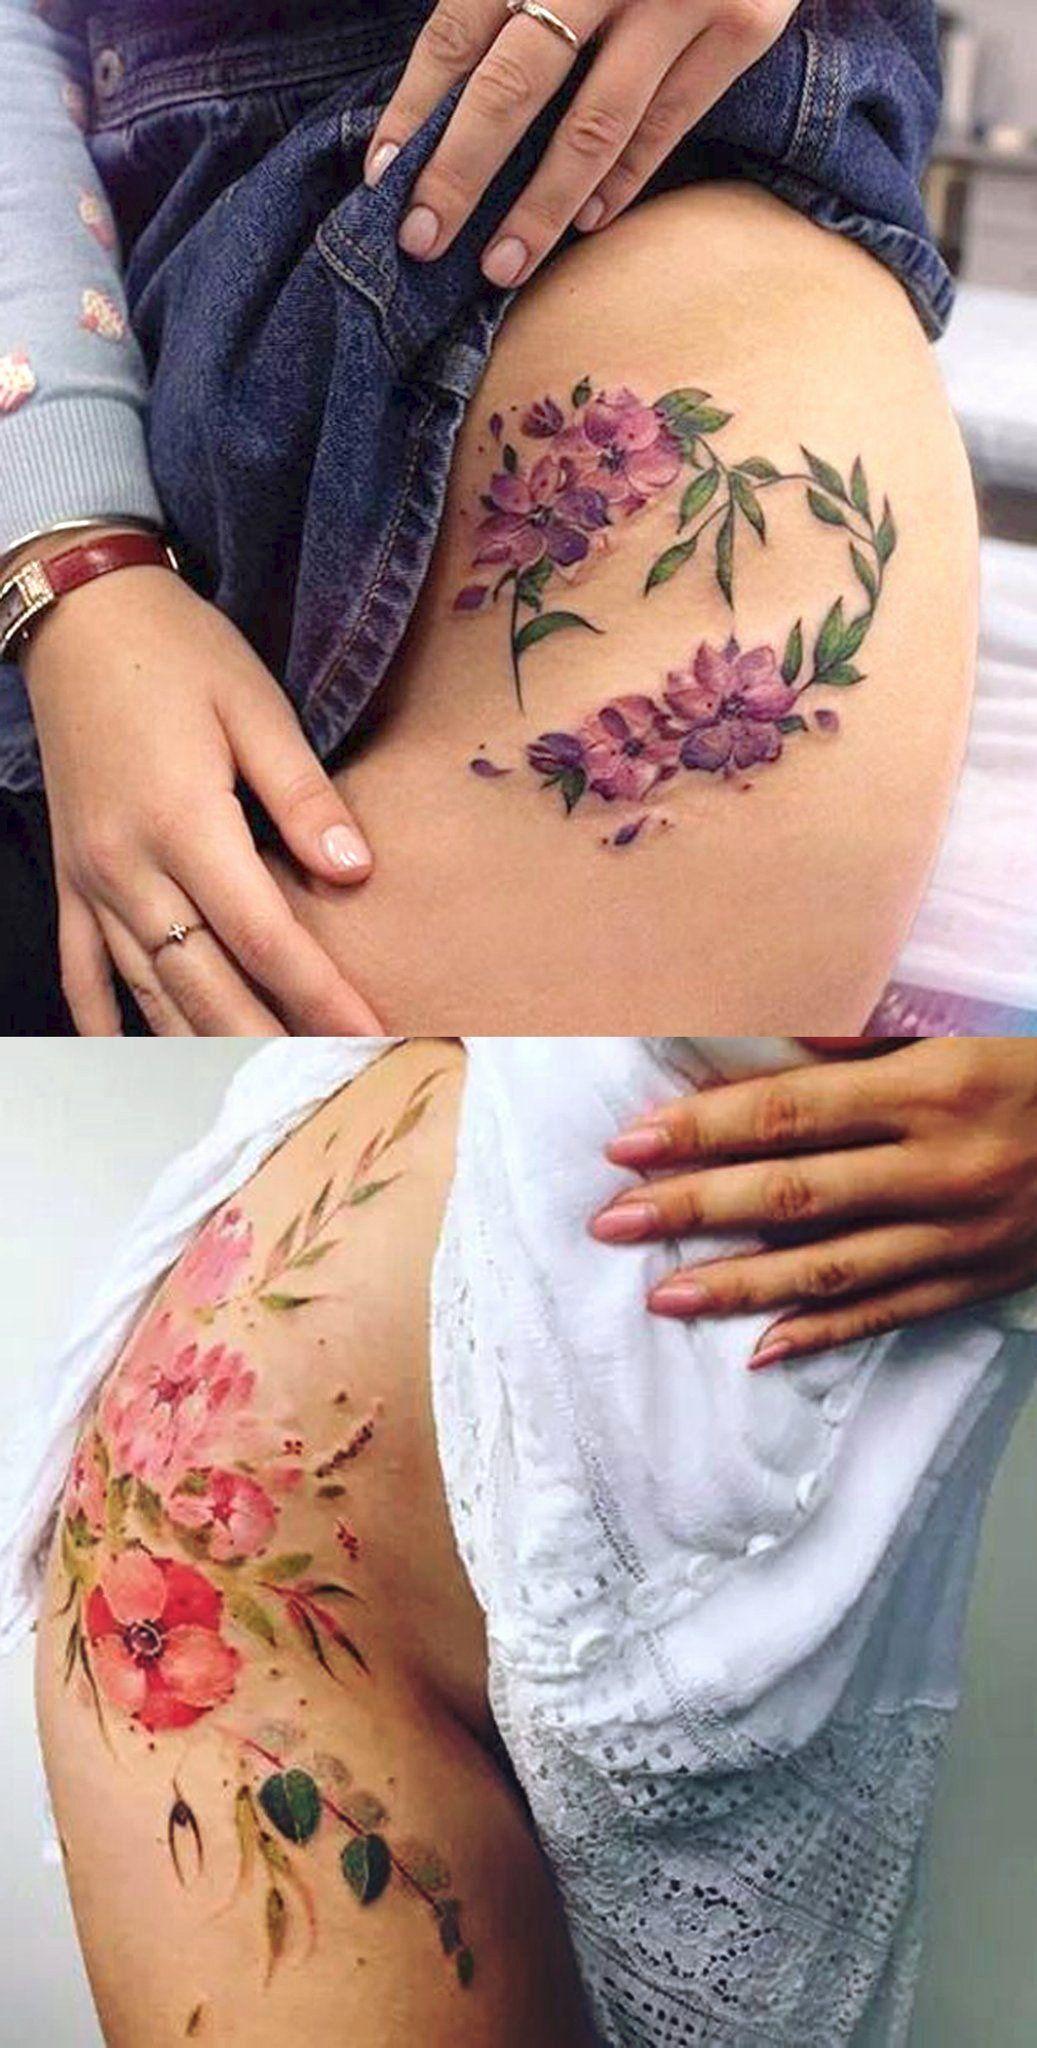 Leg Tattoo Ideas Unique 30 Women S Badass Hip Tattoo Ideas Tattoo Pinterest Thigh Hip Tattoo Flower Hip Tattoos Tattoos For Women